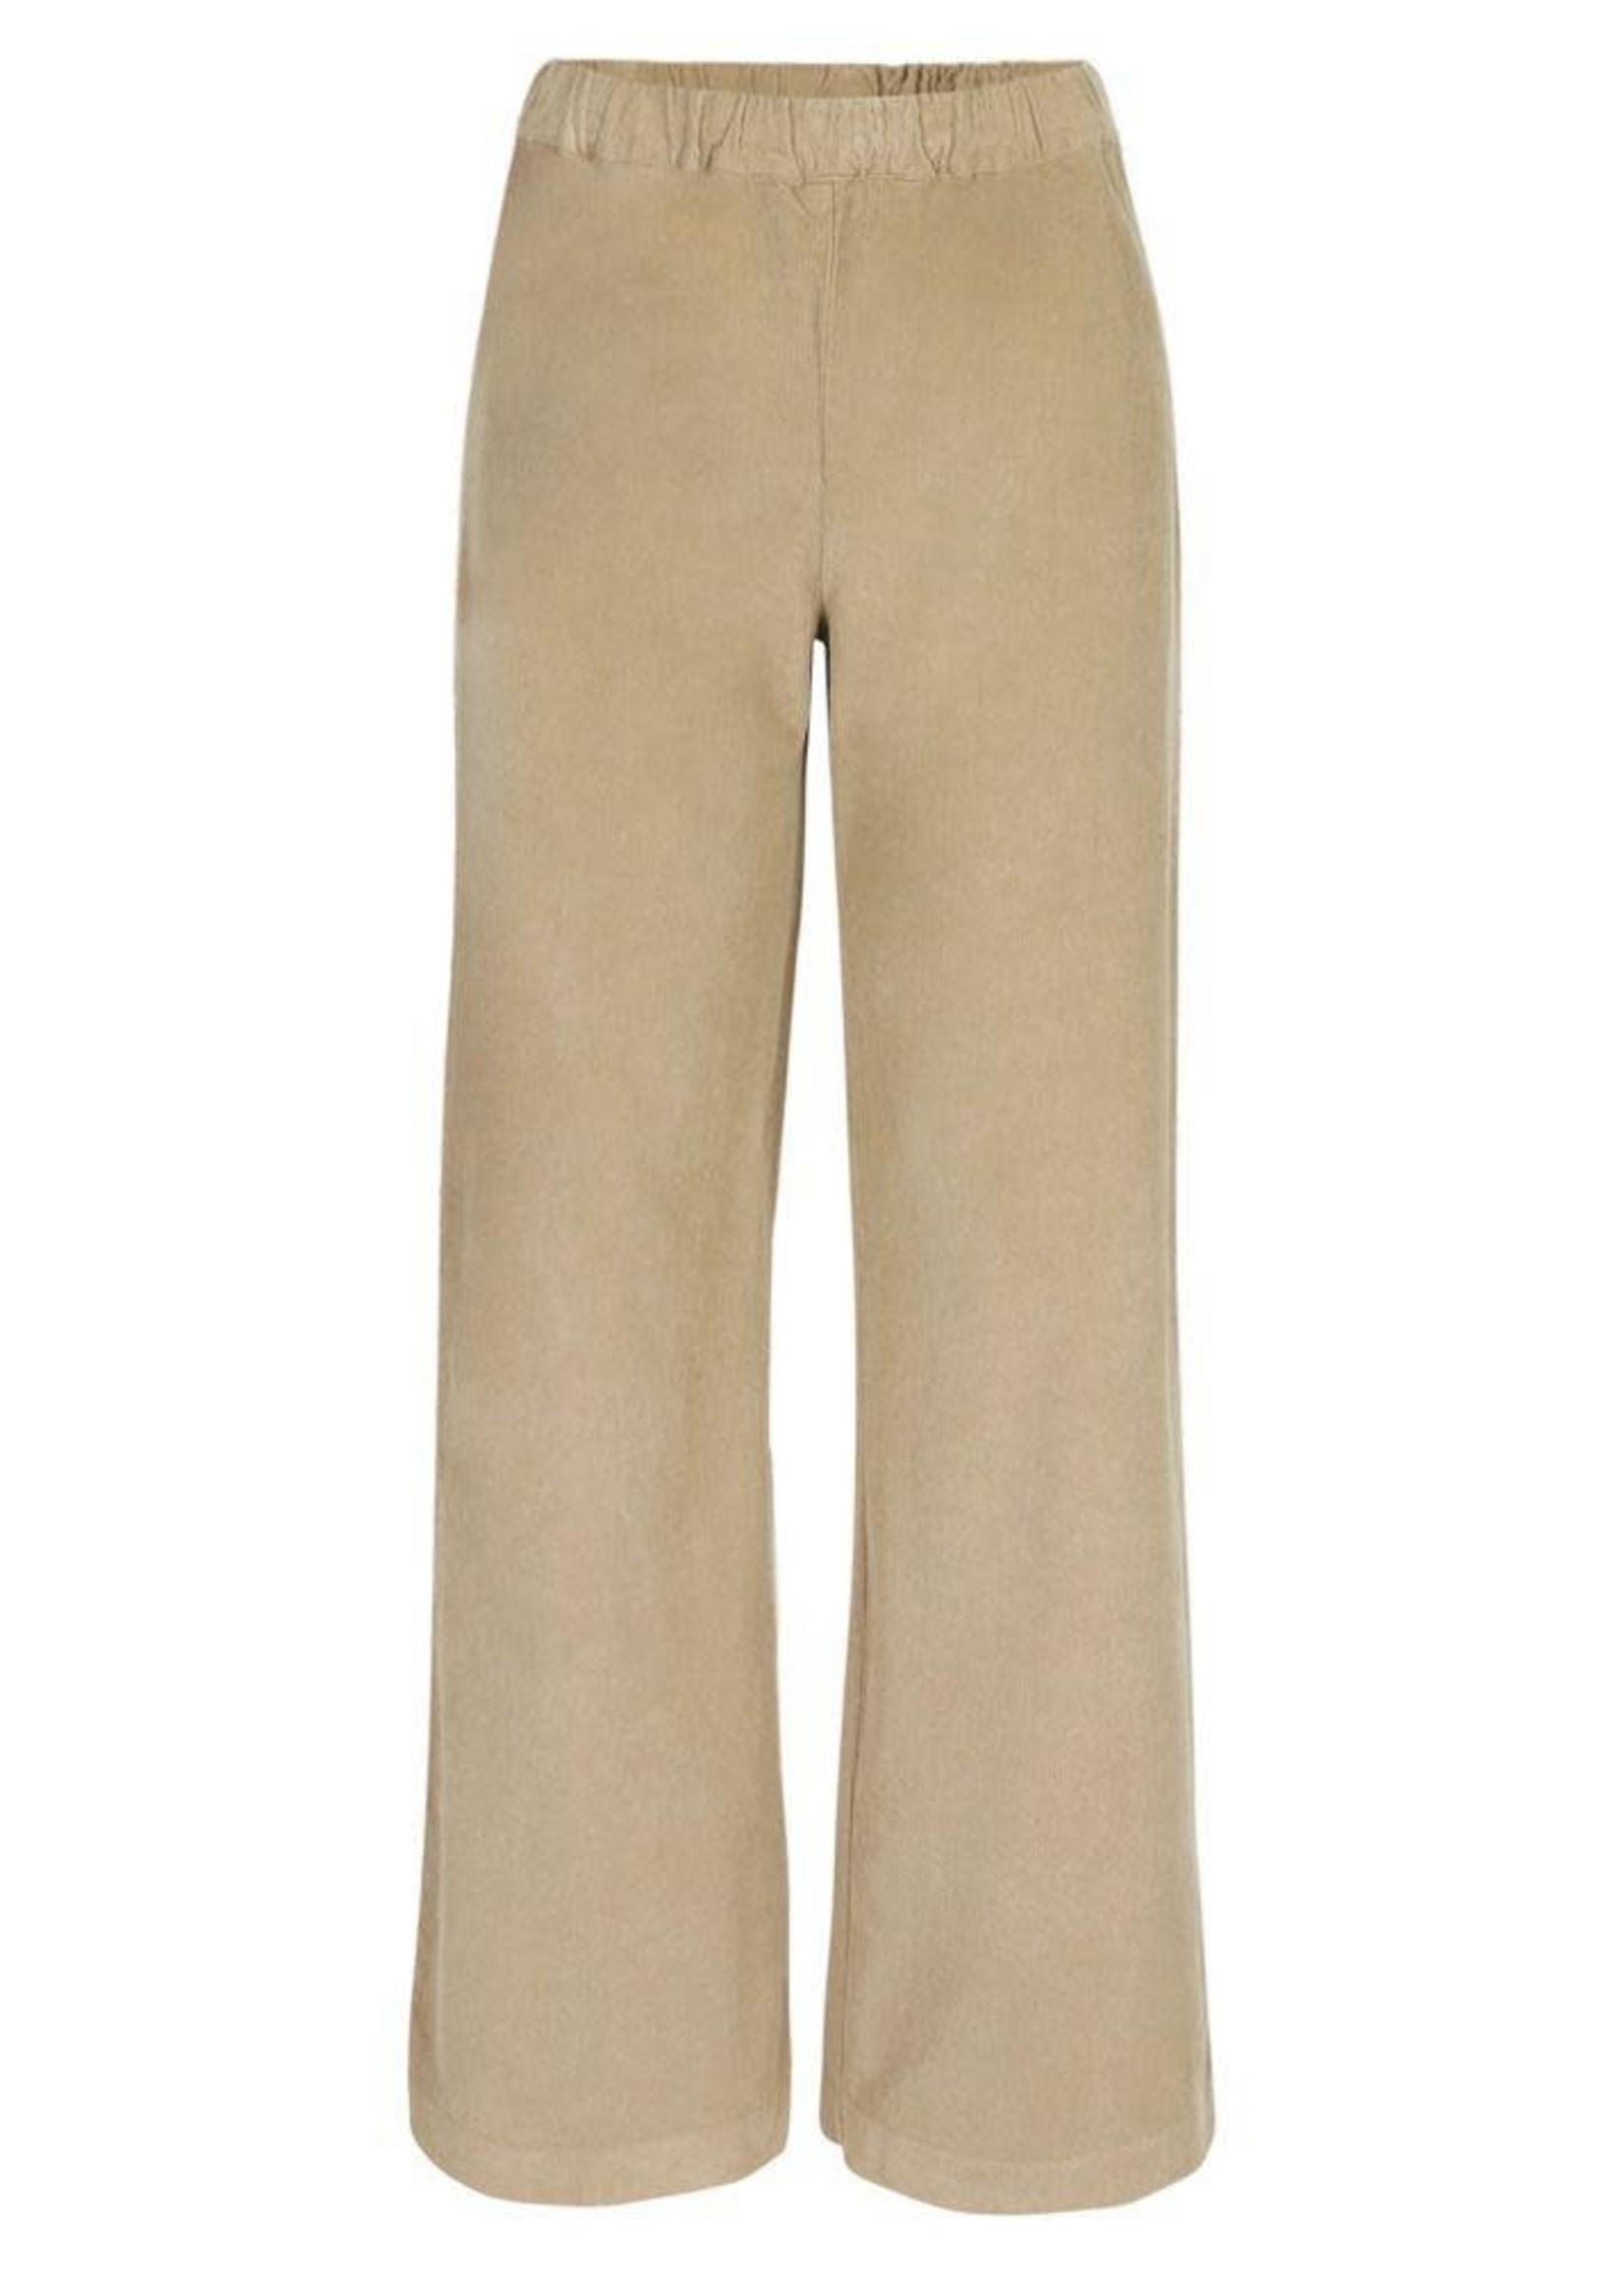 Guts & Goats Trixie Bamboo Pants